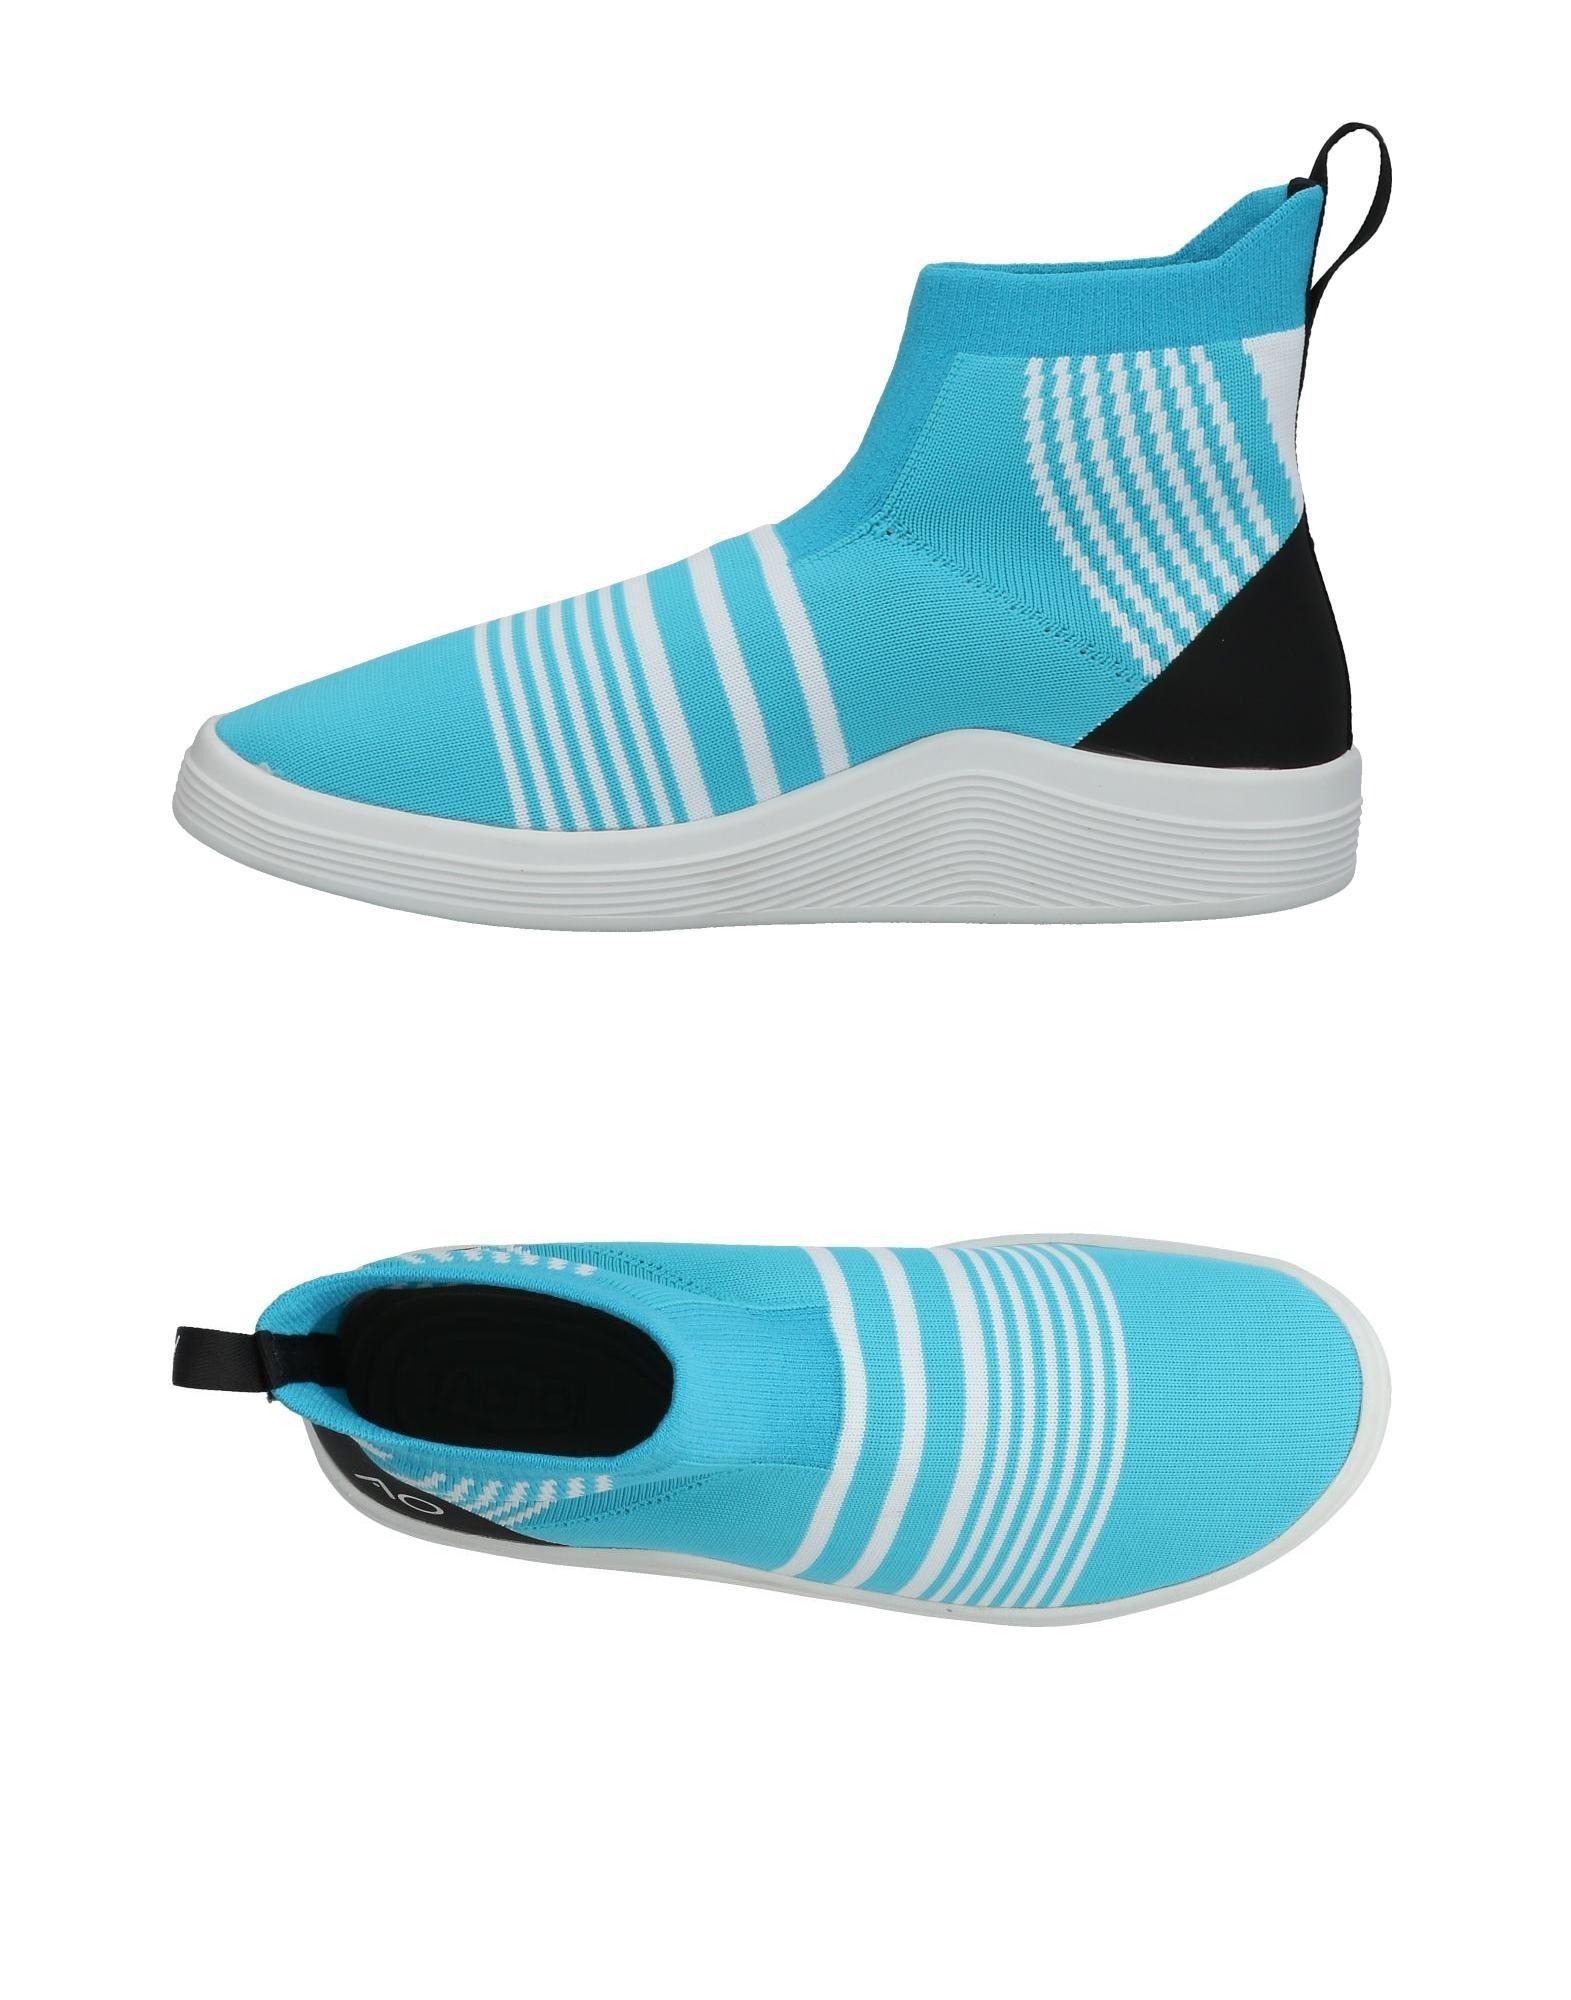 ADNO® Высокие кеды и кроссовки кеды кроссовки высокие dc council mid tx stone camo